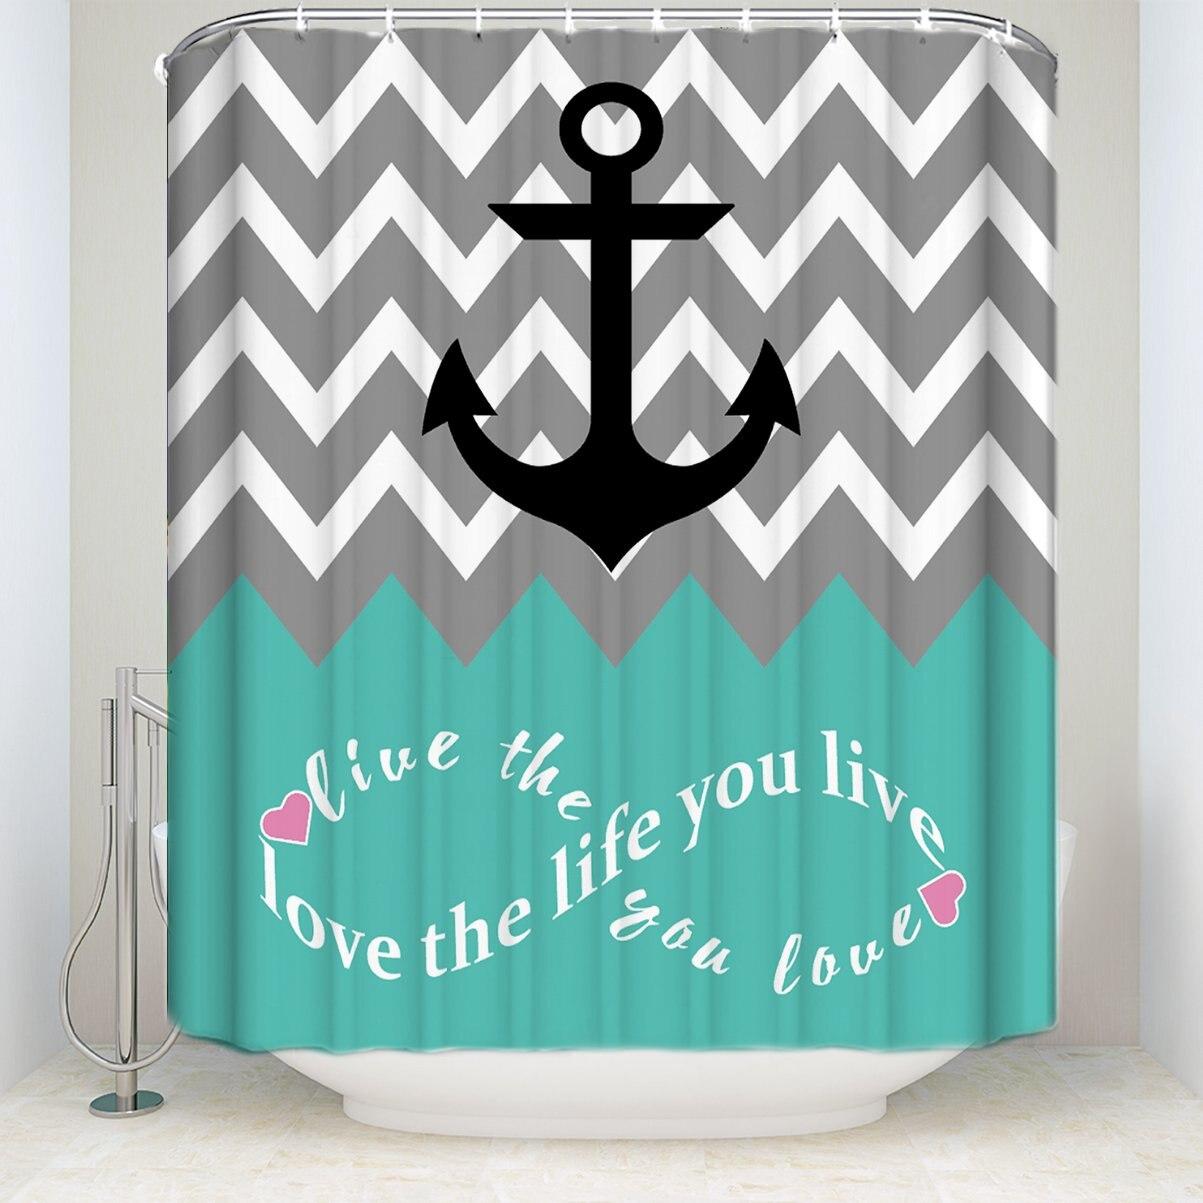 Infinity Love The Life You Live шеврон узор якорь бирюзовый серый белый водонепроницаемый декор для ванной комнаты